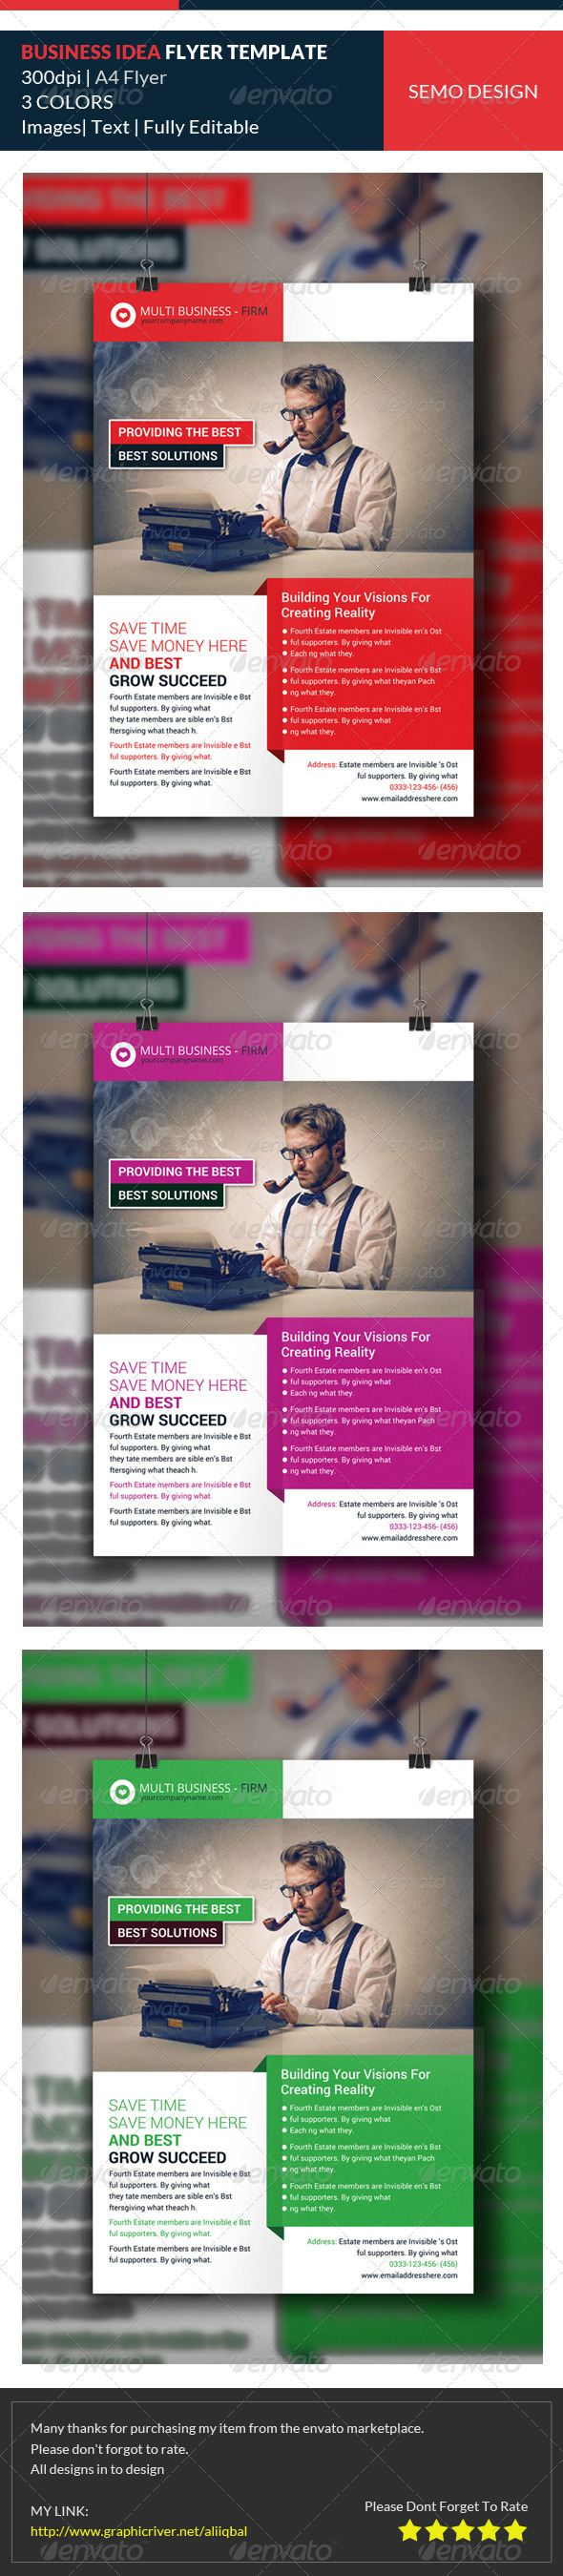 GraphicRiver Corporate Business Idea Flyer Template 7988140